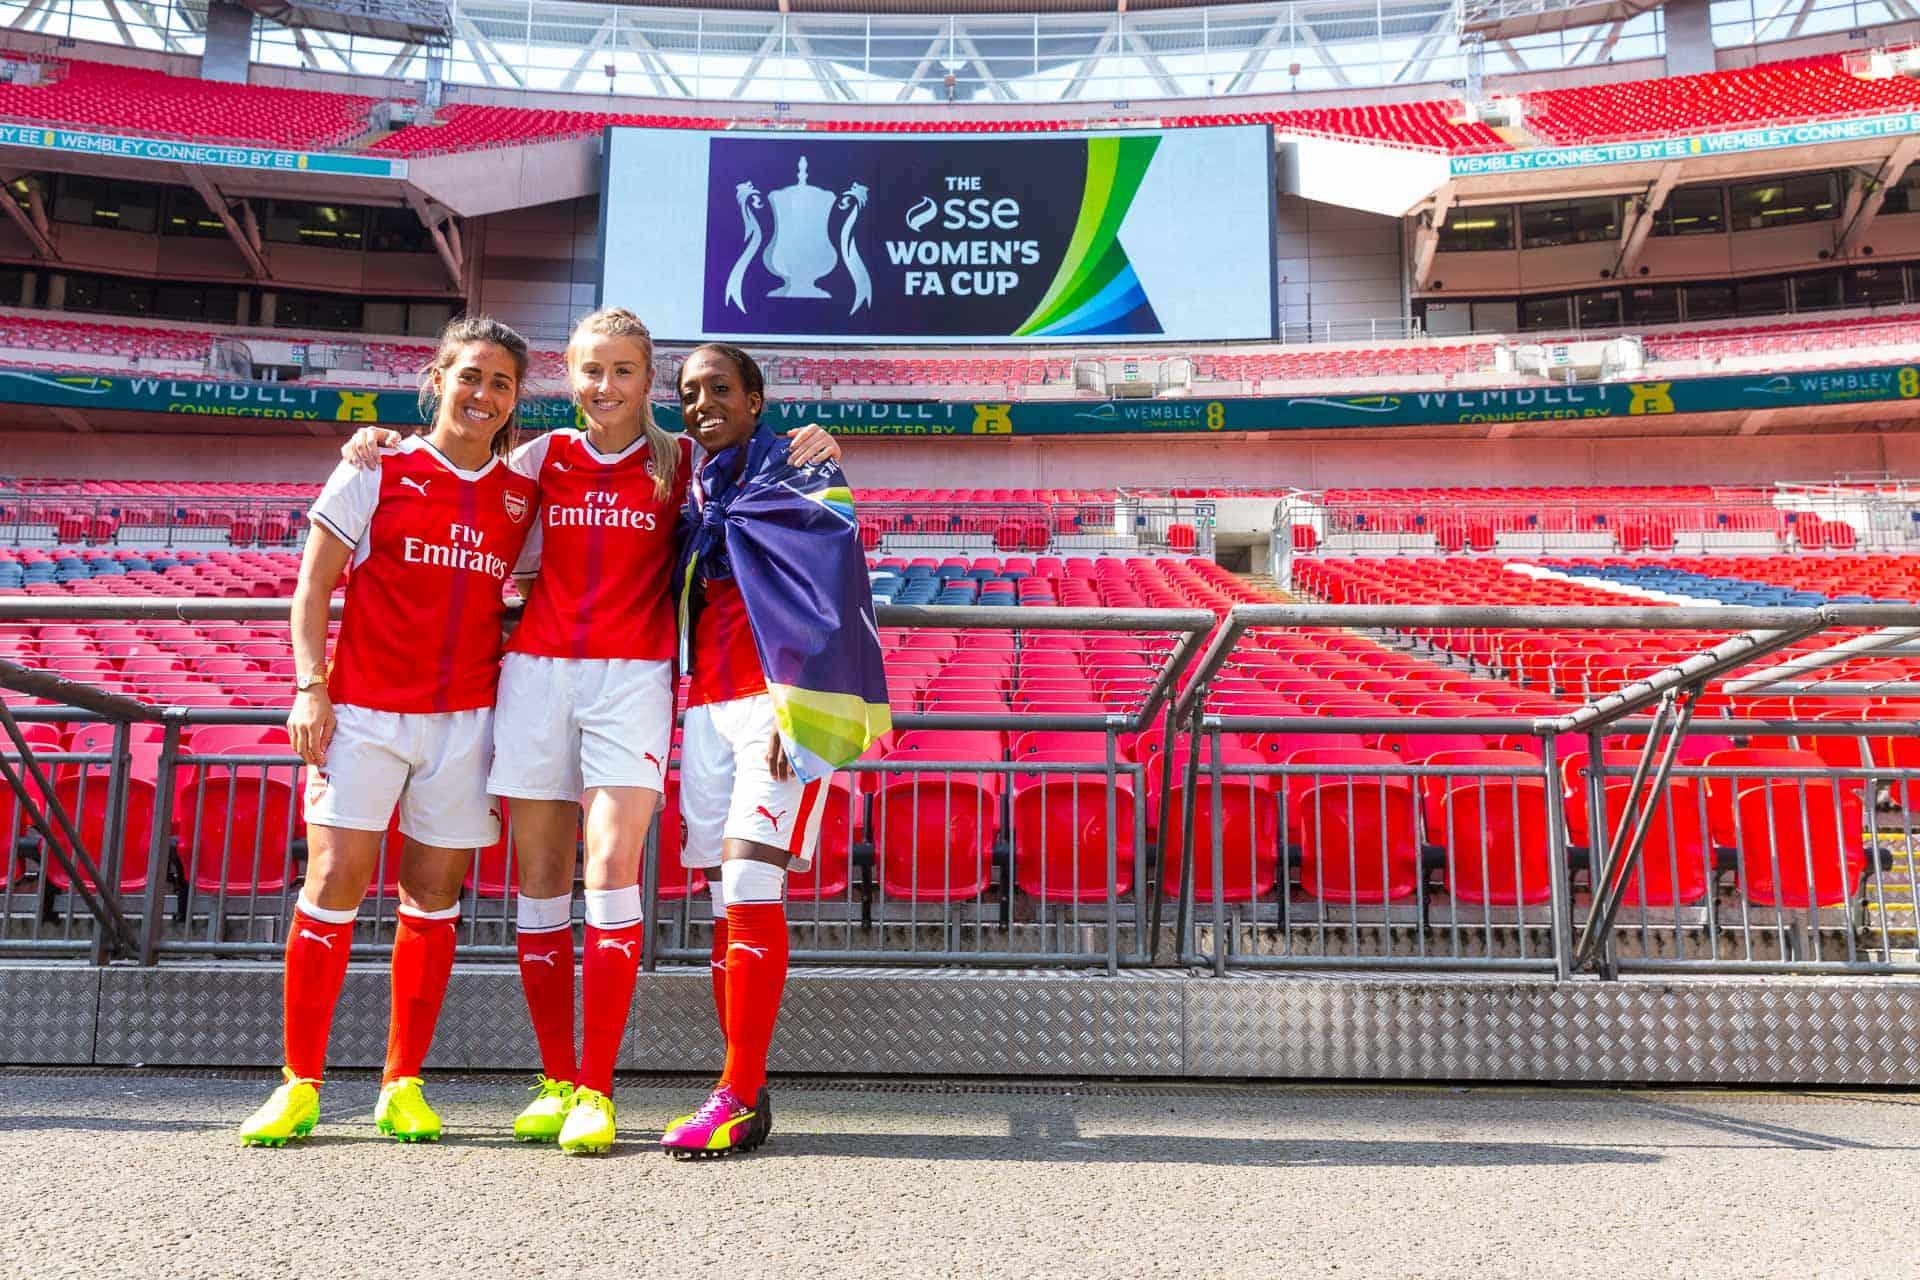 Women's FA Cup final SSE